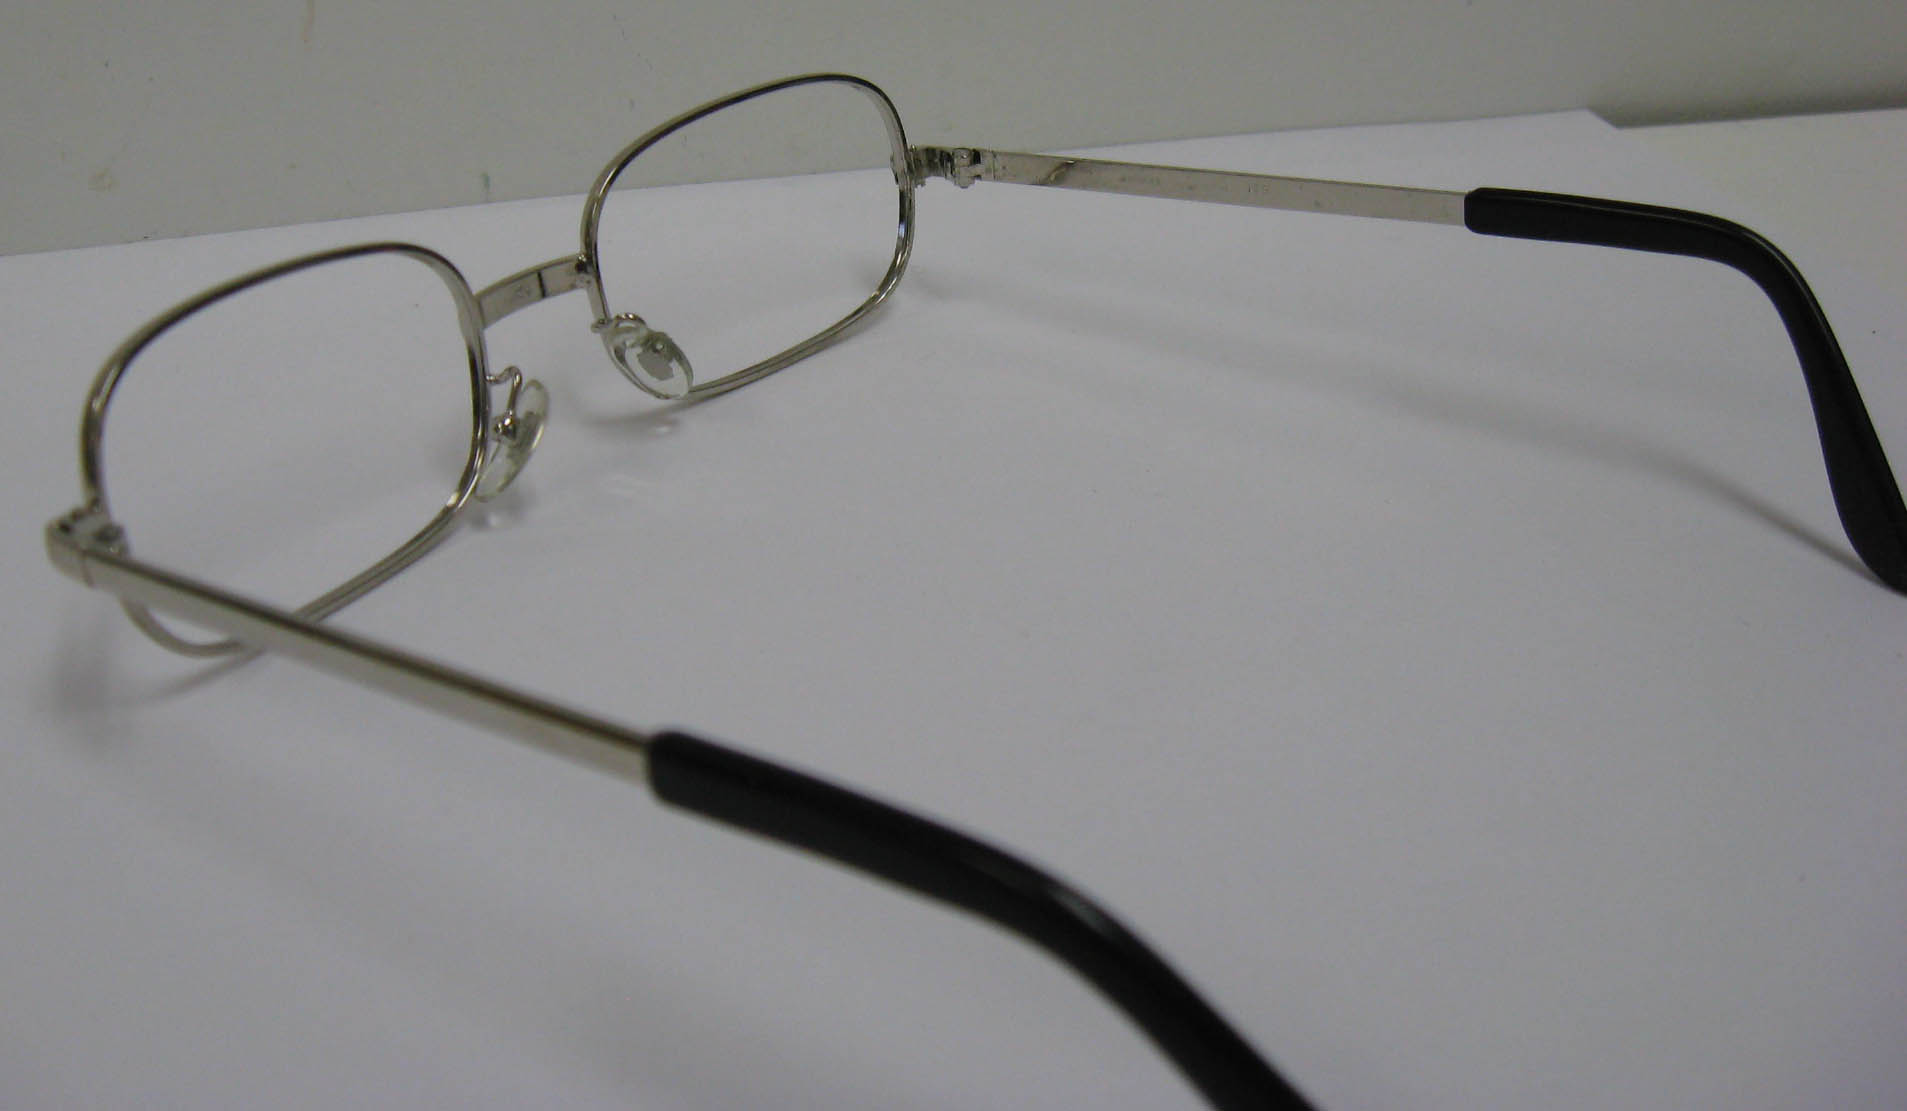 Glasses Frame In French : Vintage EYE GLASSES EYEGLASS French FRAMES WIRES LARONDE ...